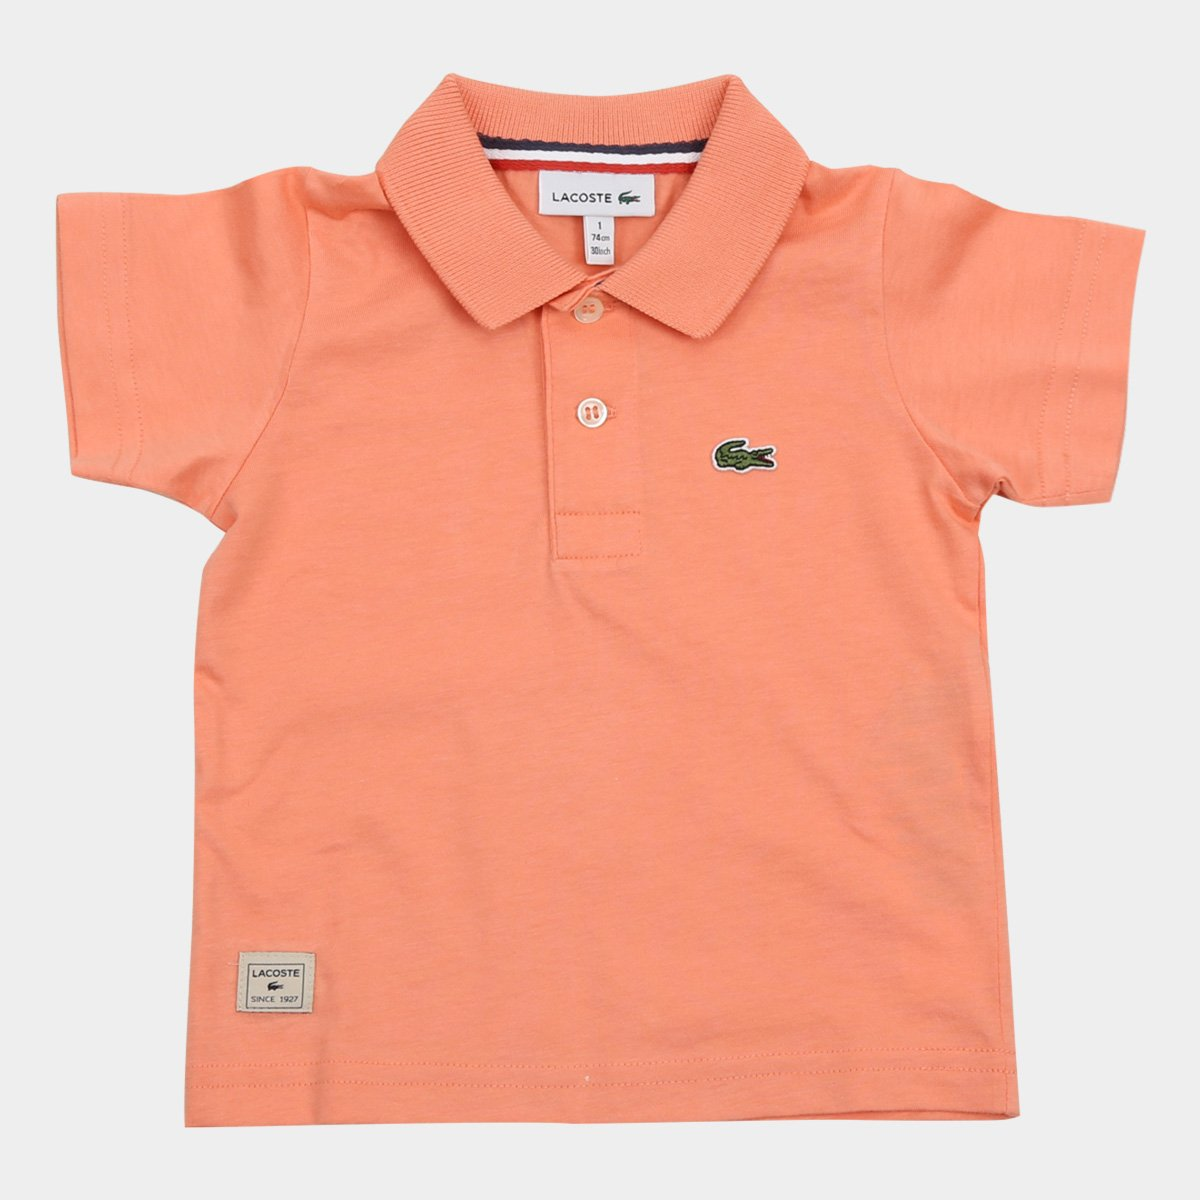 56df51f8a7529 Camisa Polo Infantil Lacoste Masculina - Compre Agora